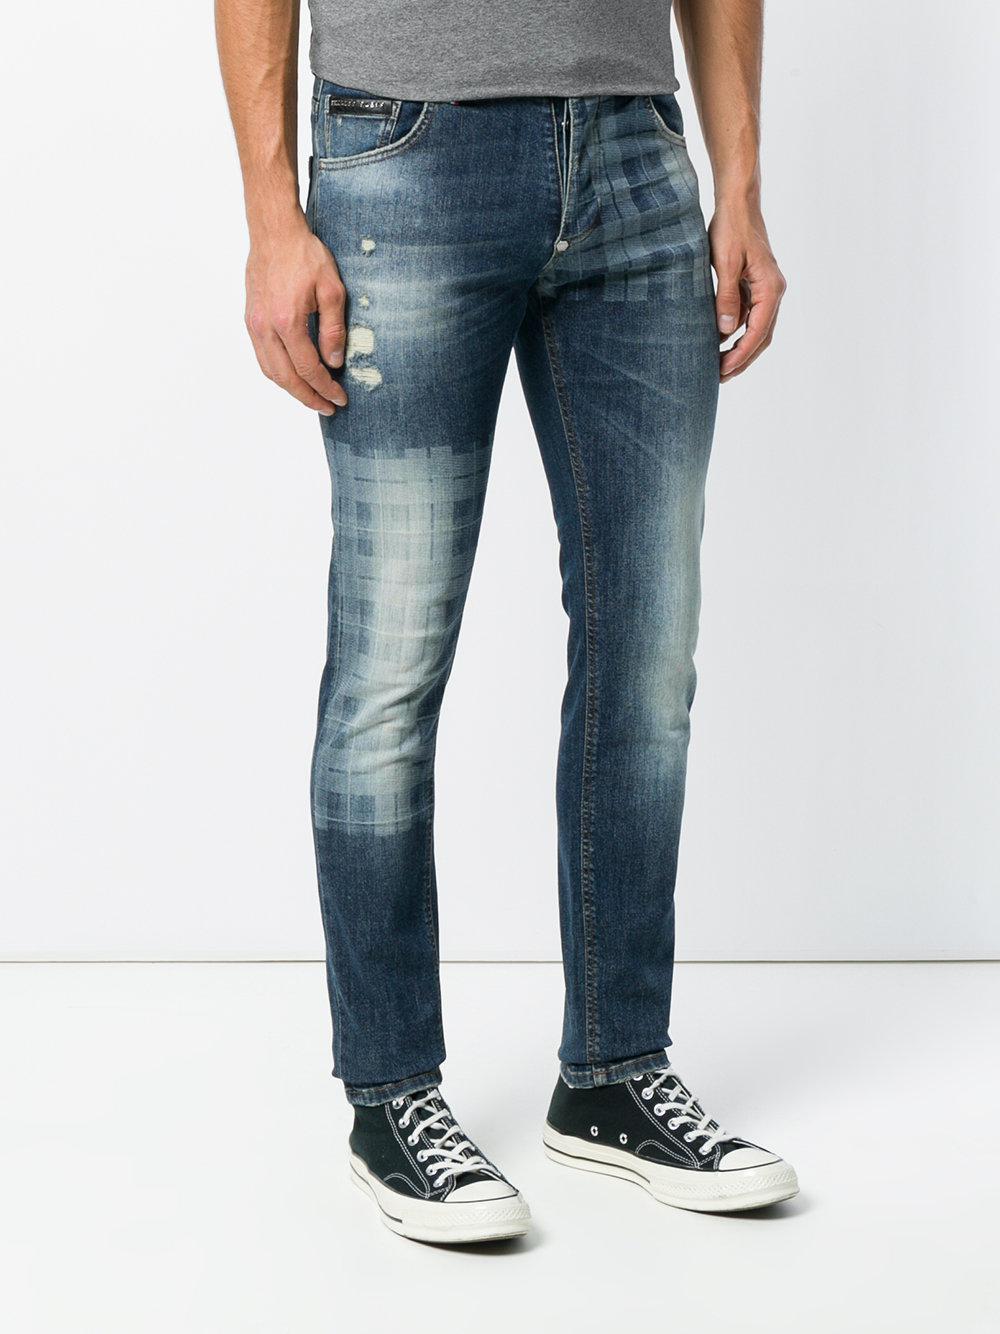 Philipp Plein Denim Faded Skinny Jeans in Blue for Men